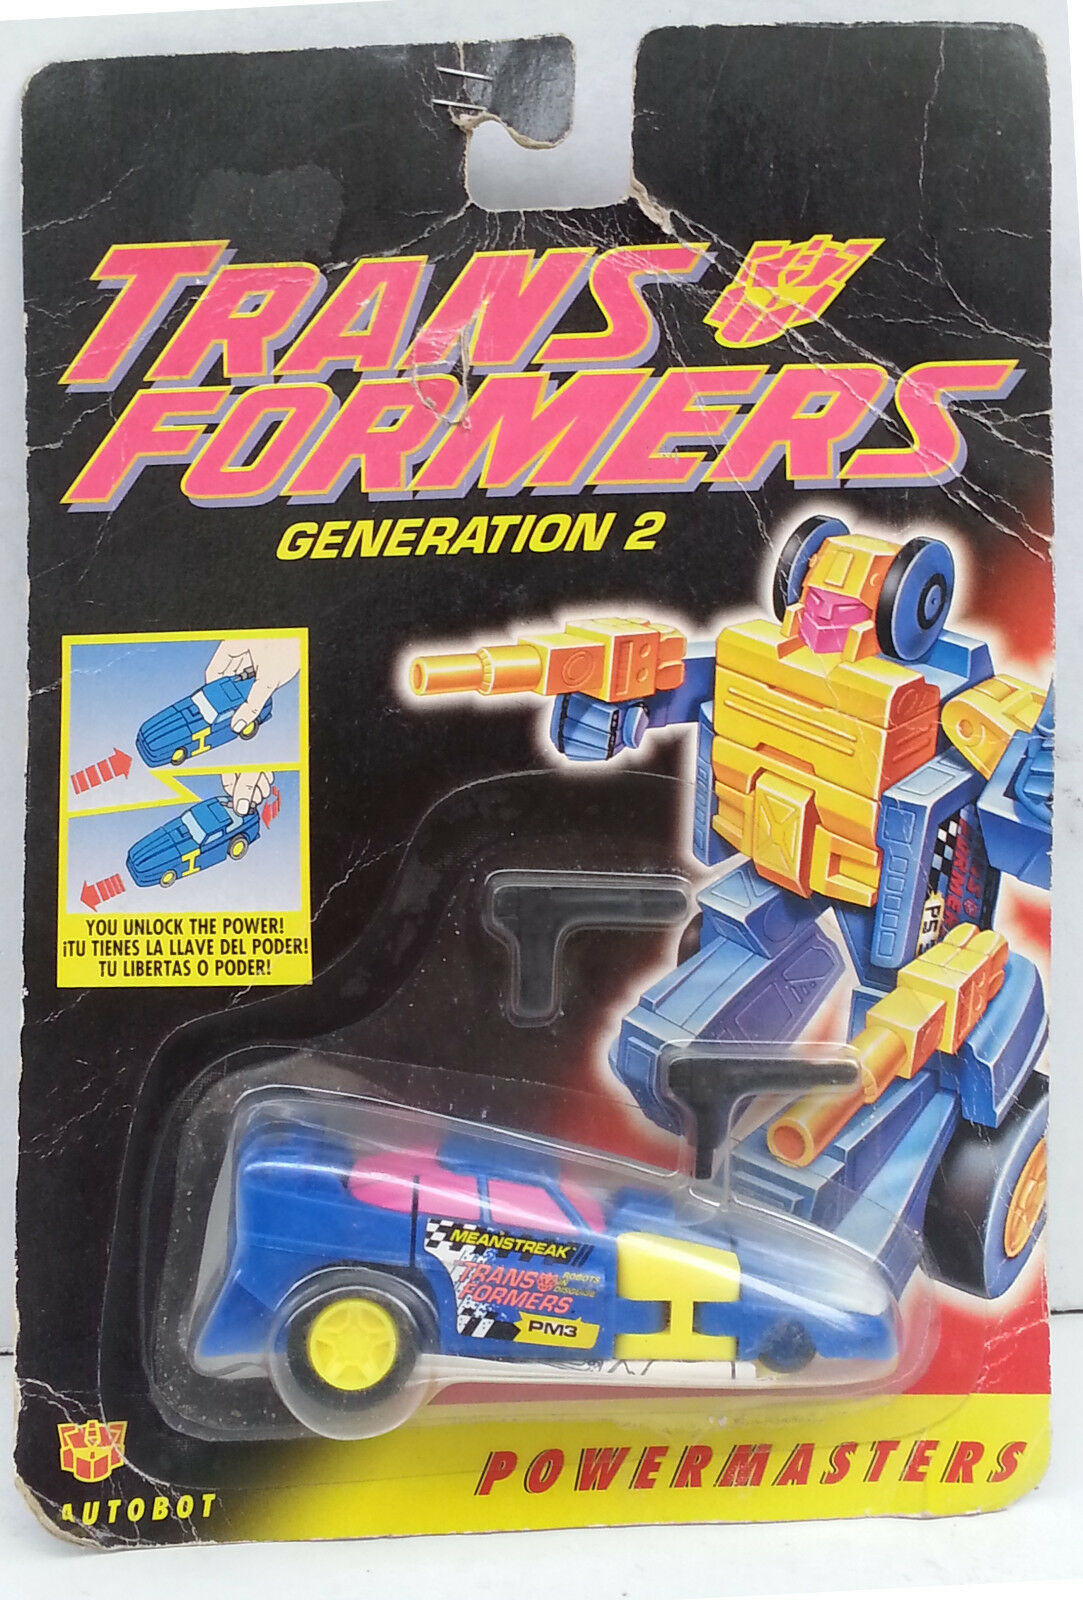 Transformers Generation 2 Powermasters Autobot Hasbro 1994 MIB